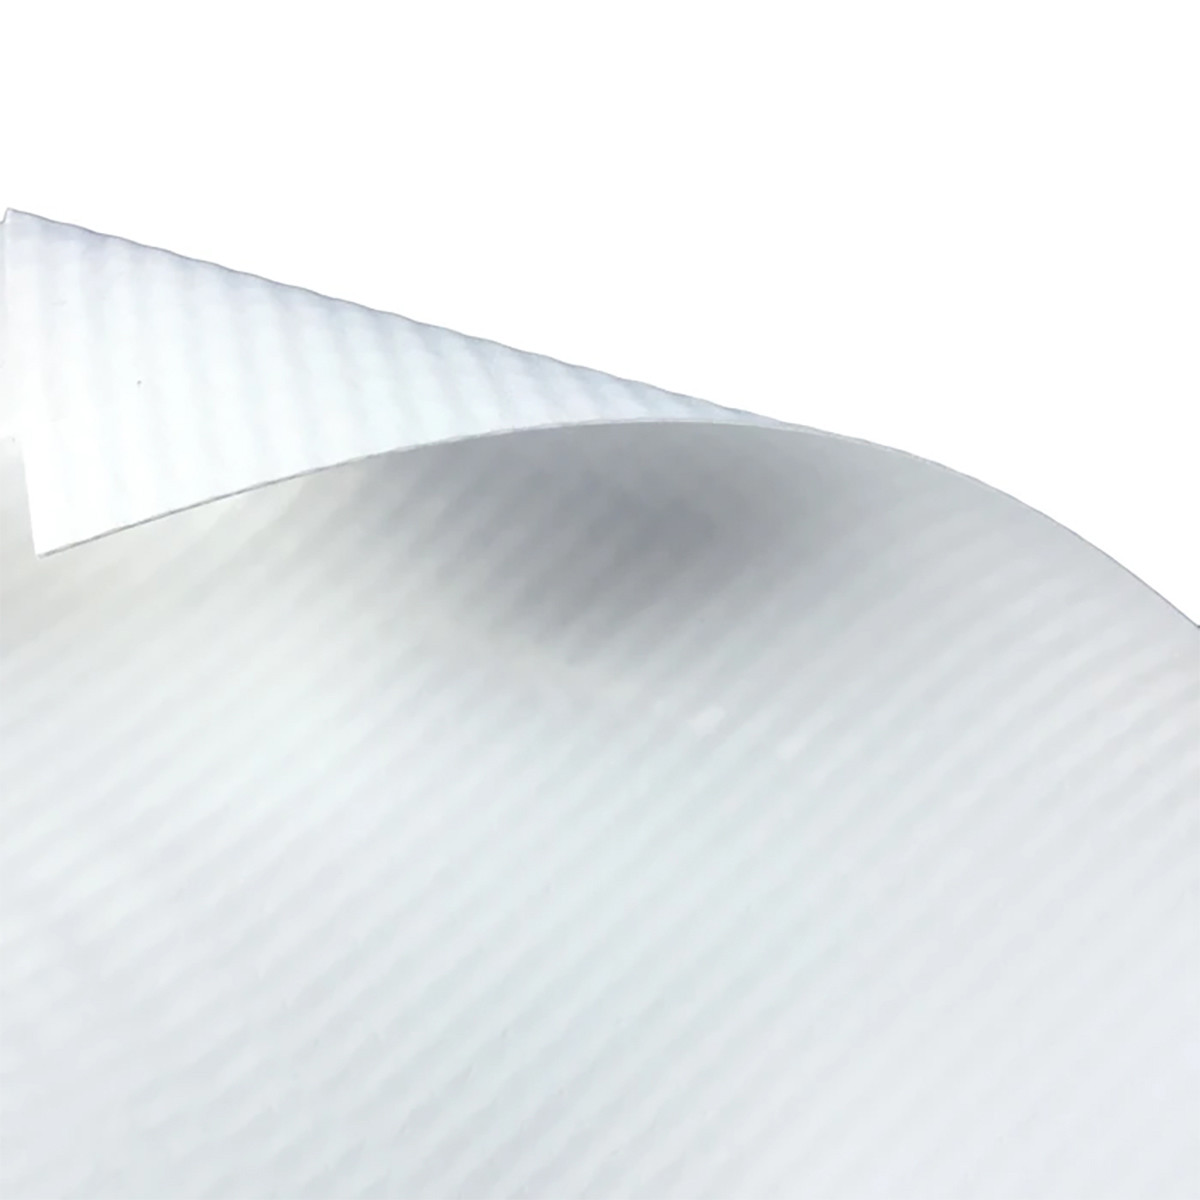 Frontlit baner 1.6x50m 440g sjaj